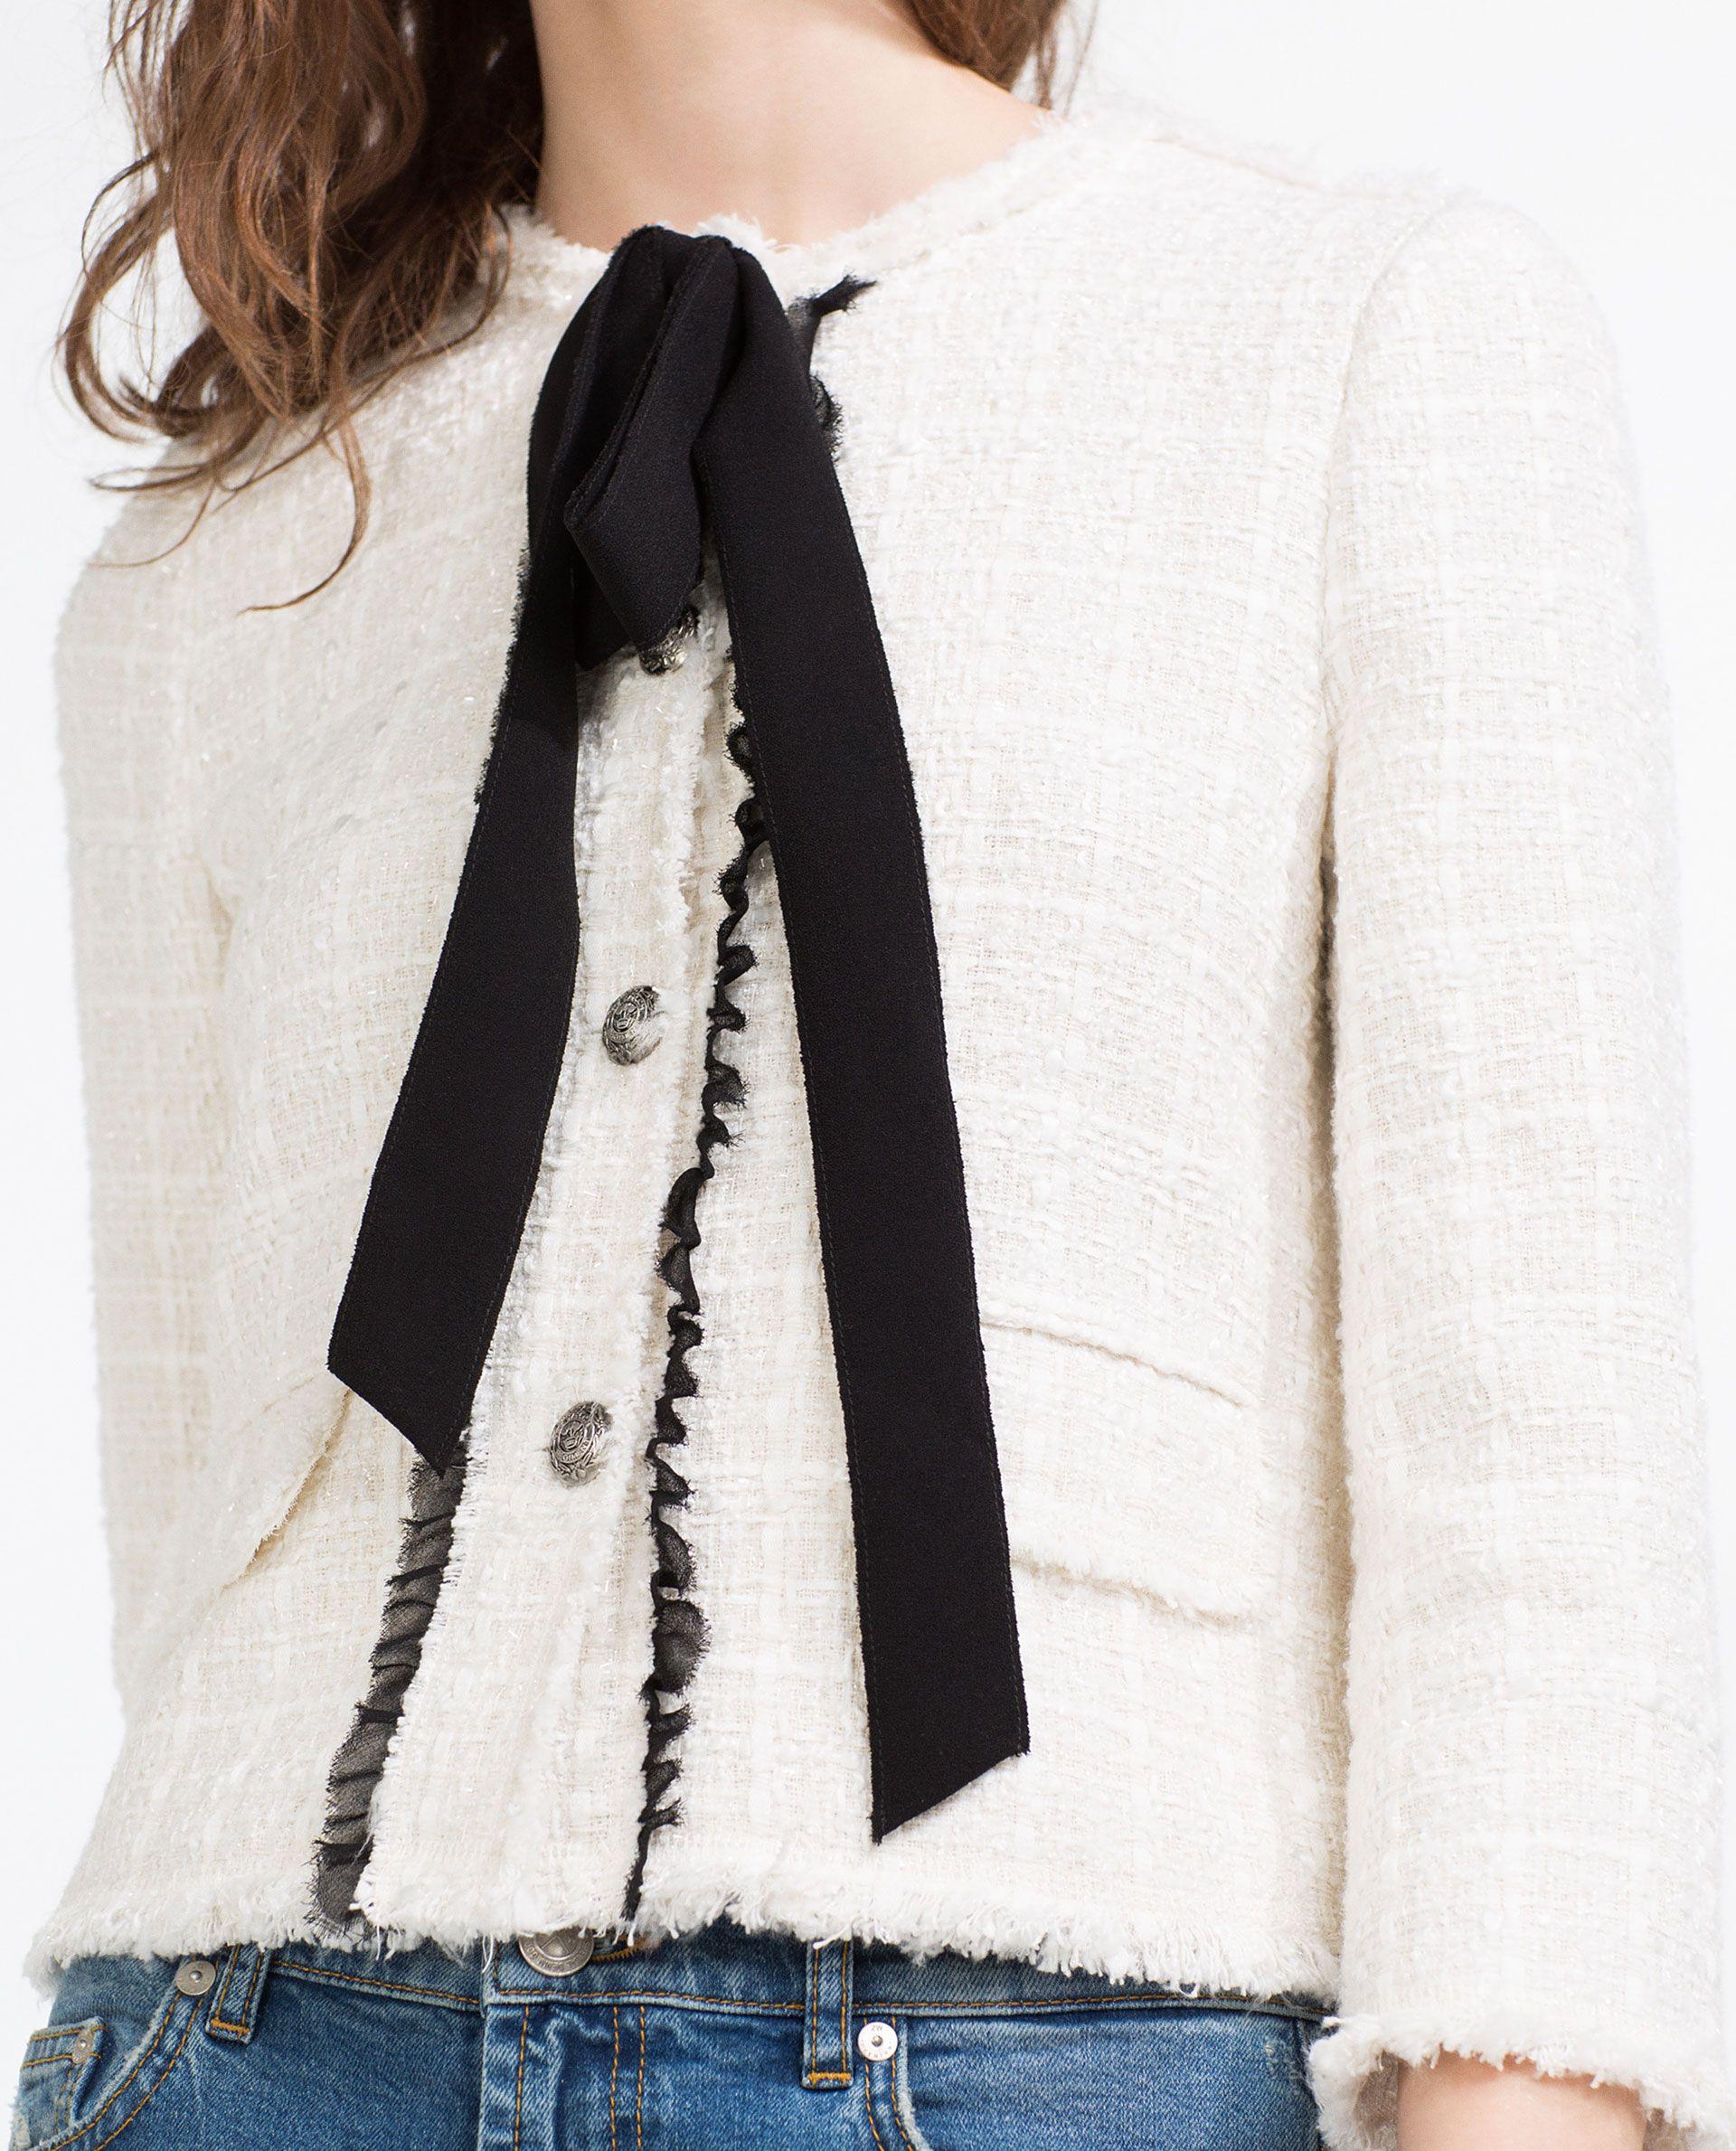 2c7b17c3 JACKET WITH BOW | JACKETS & WRAPS | Zara jackets, Jackets, Jeans ...